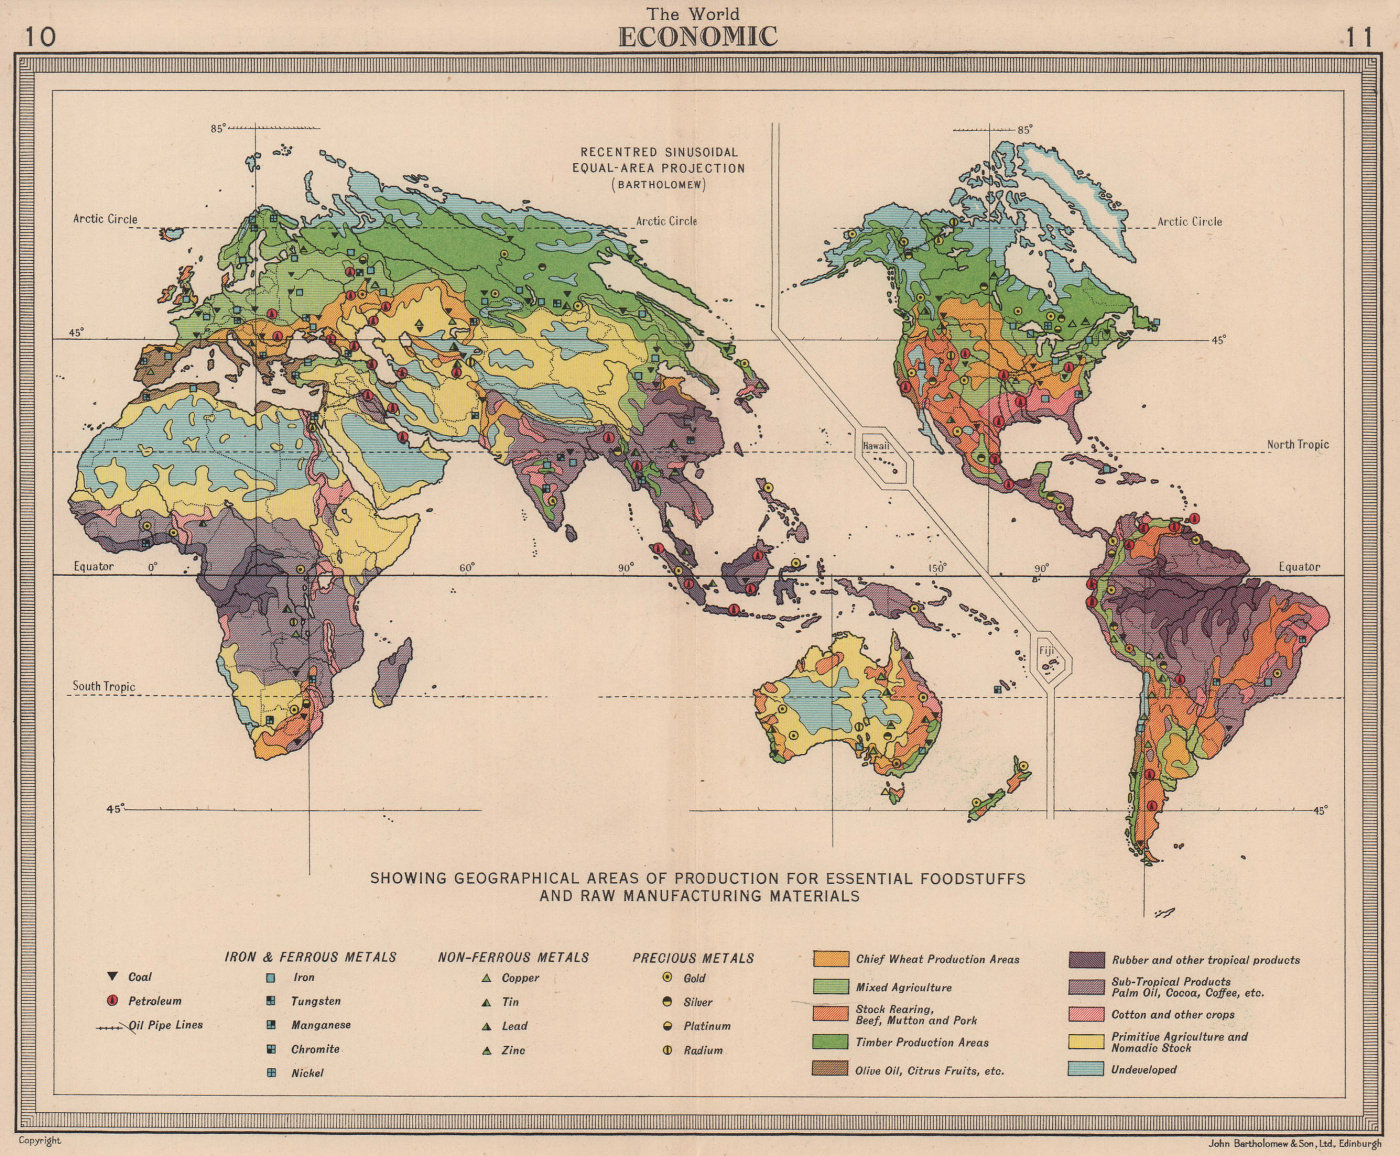 World Economic. Recentred Sinusoidal equal-area projection. BARTHOLOMEW 1949 map